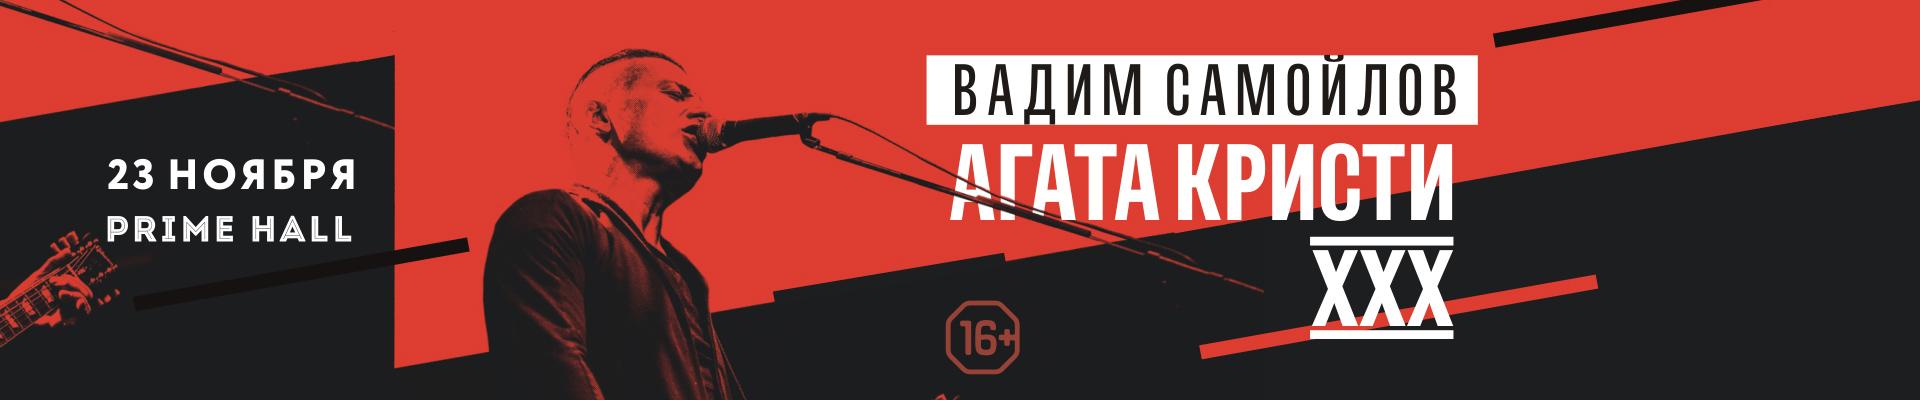 Вадим Самойлов.